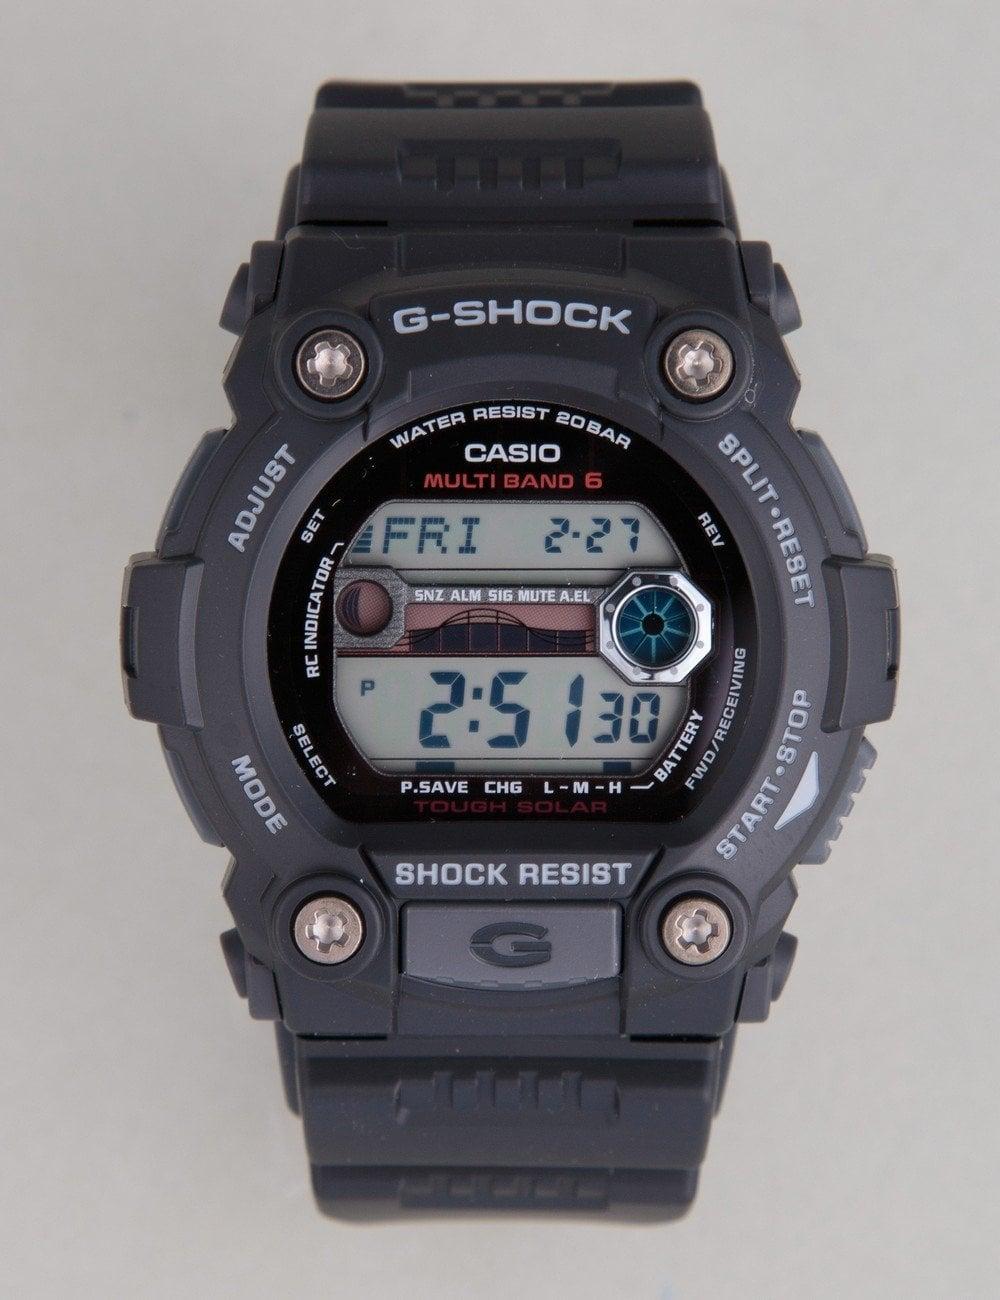 G-Shock GW-7900-1ER Watch - Black e0271c96854